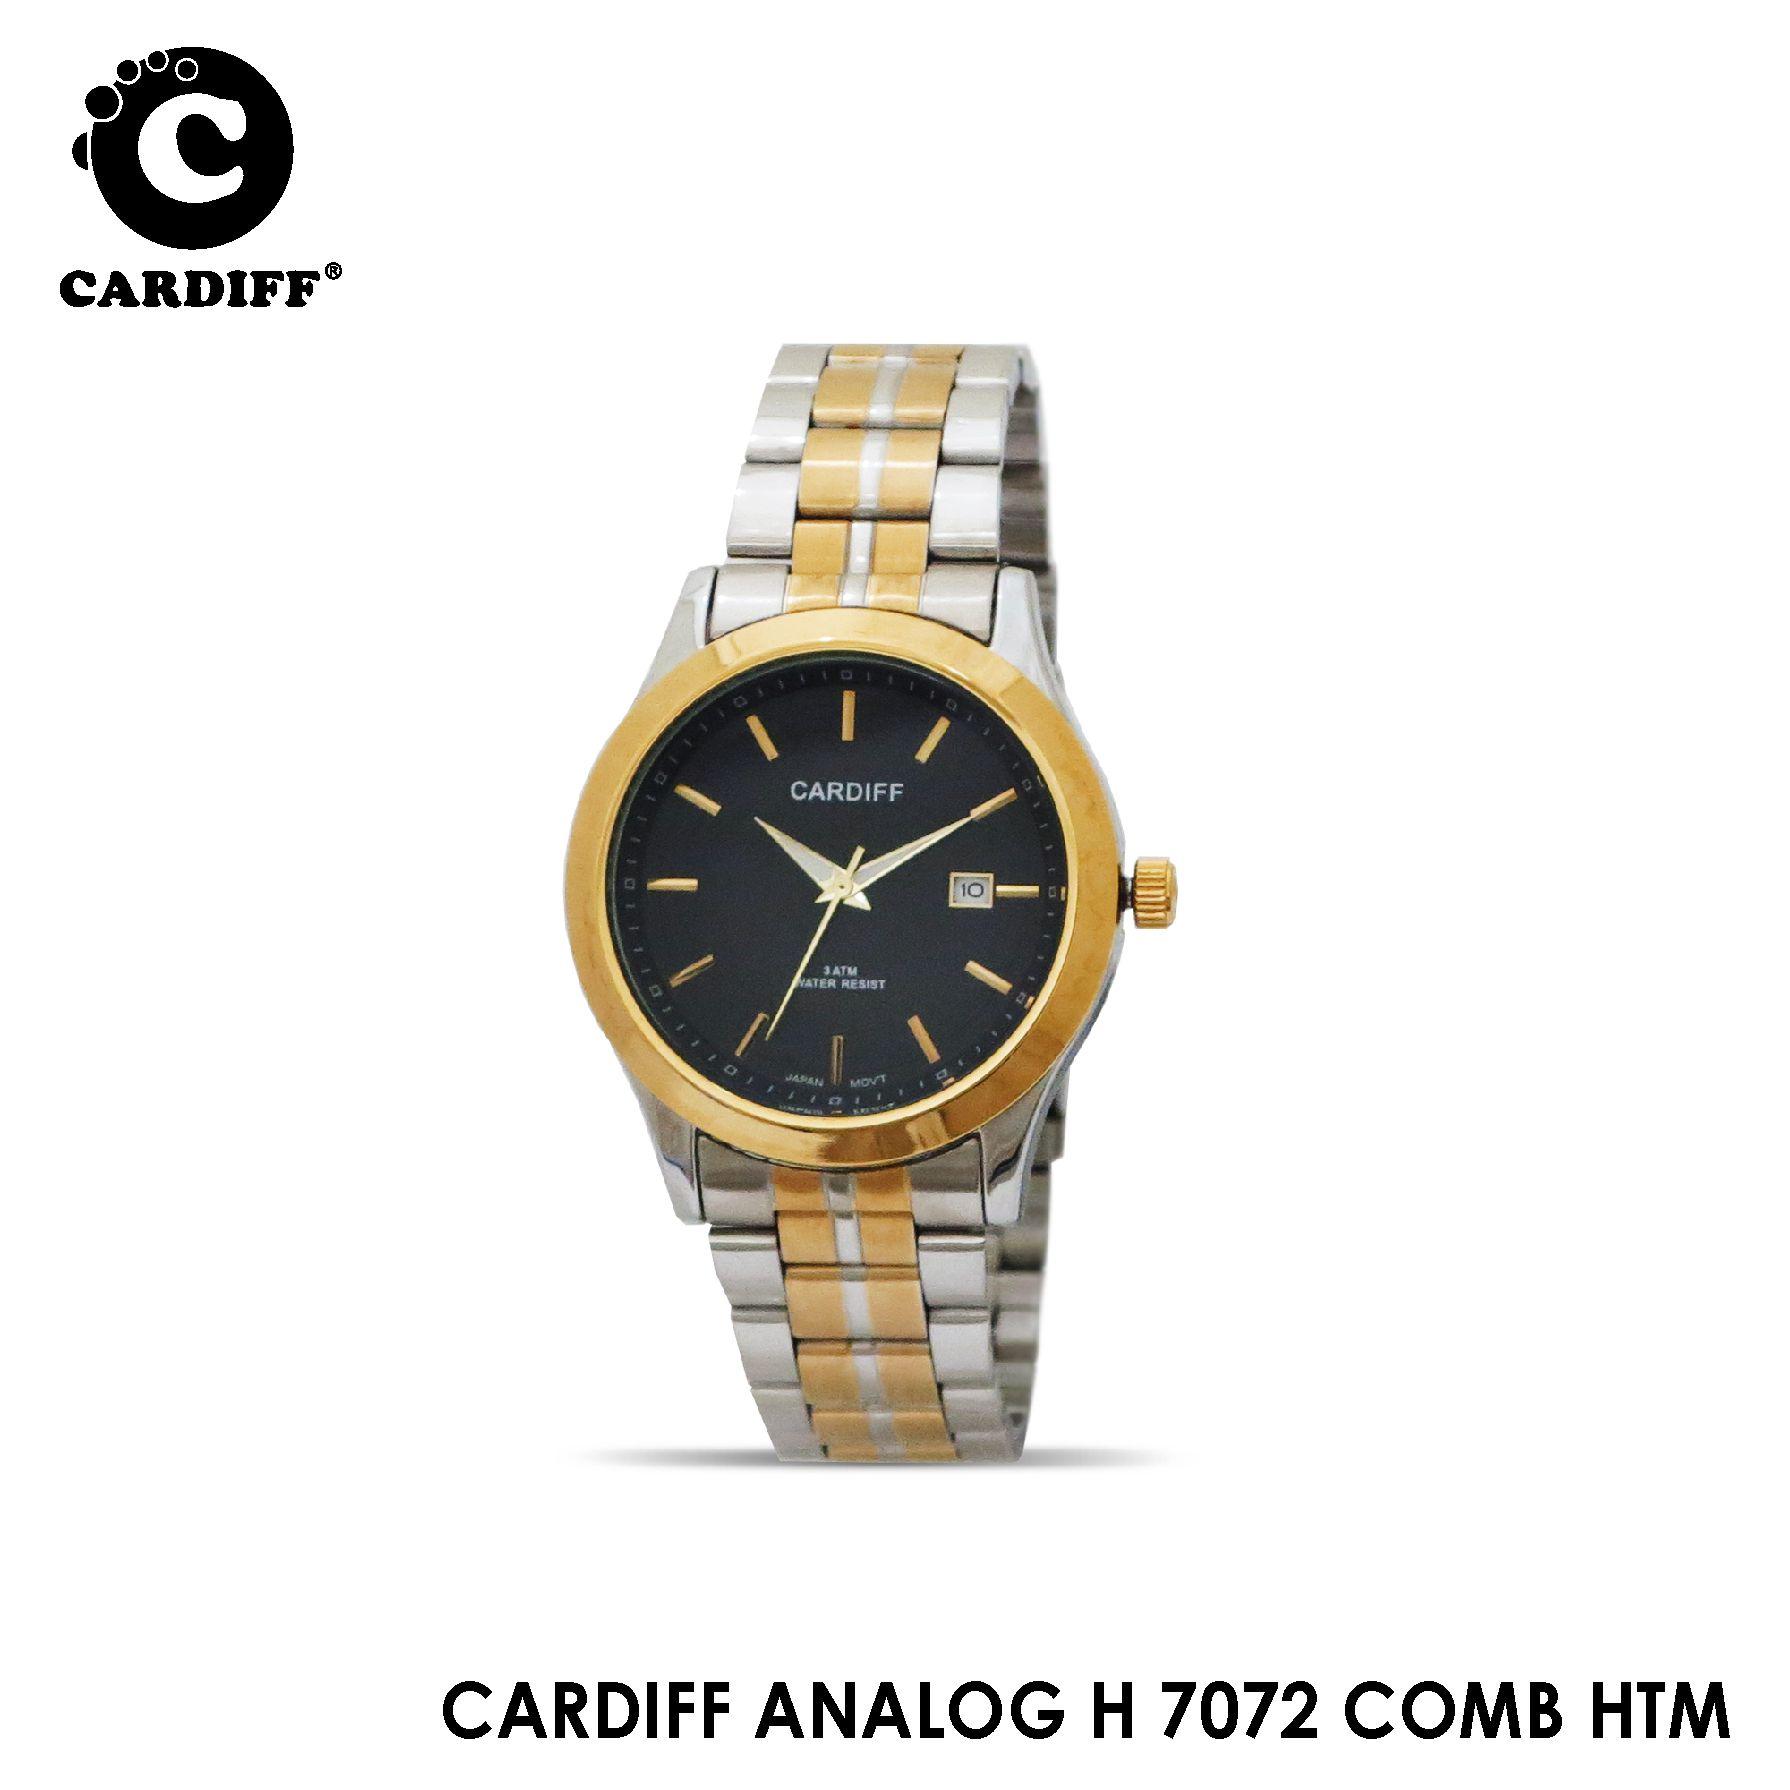 Cardiff Analog H 7072